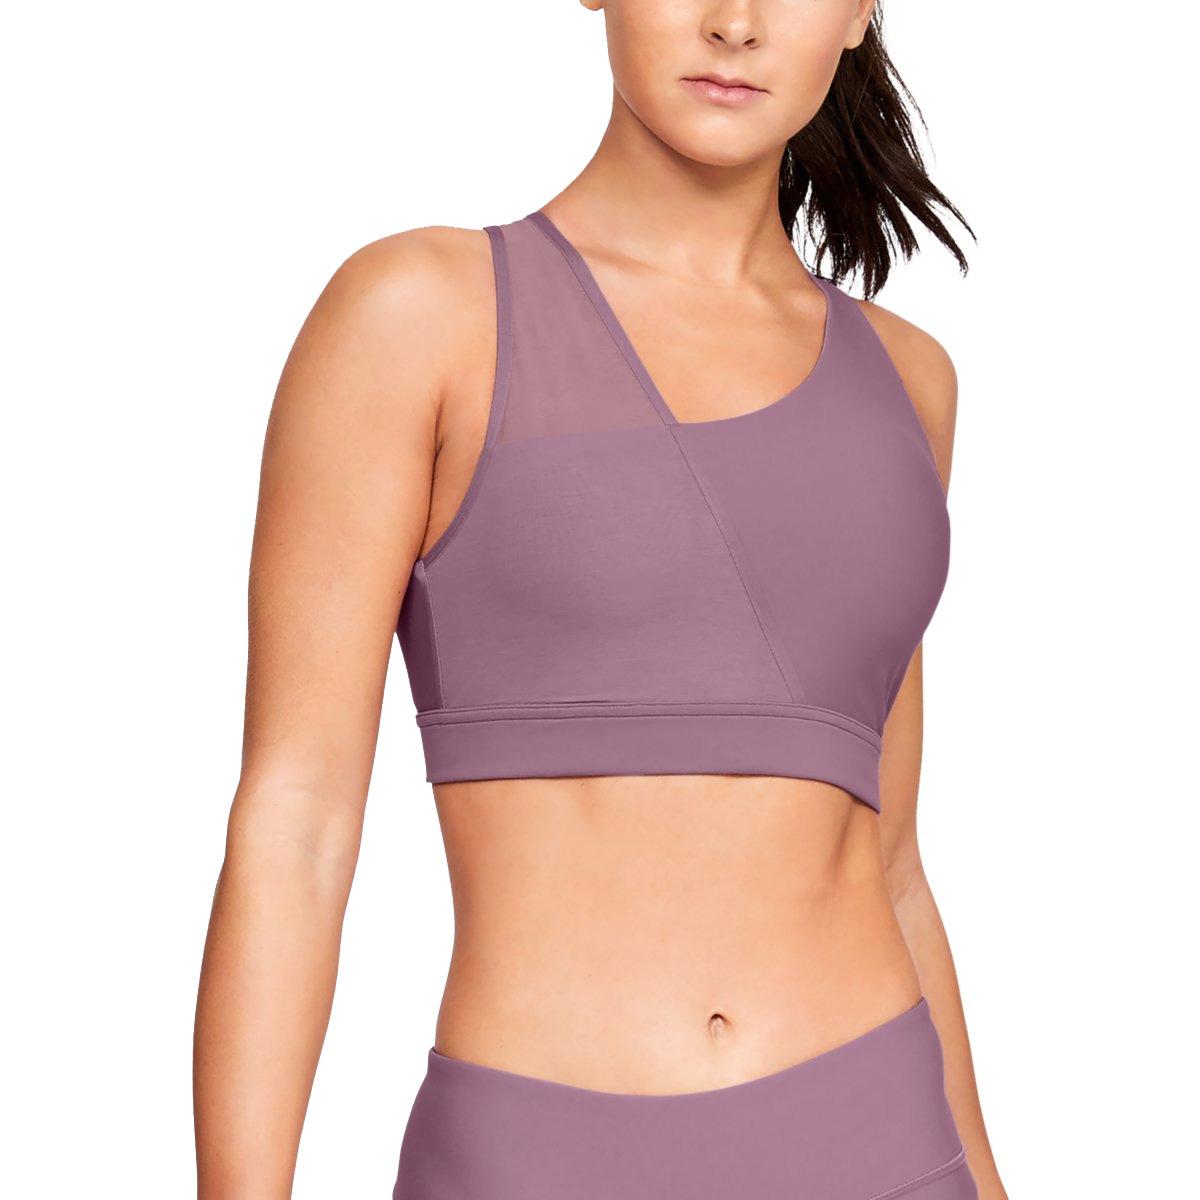 86e97202be732 Under Armour Women s Vanish Asymmetric Low Sports Bra - Purple ...